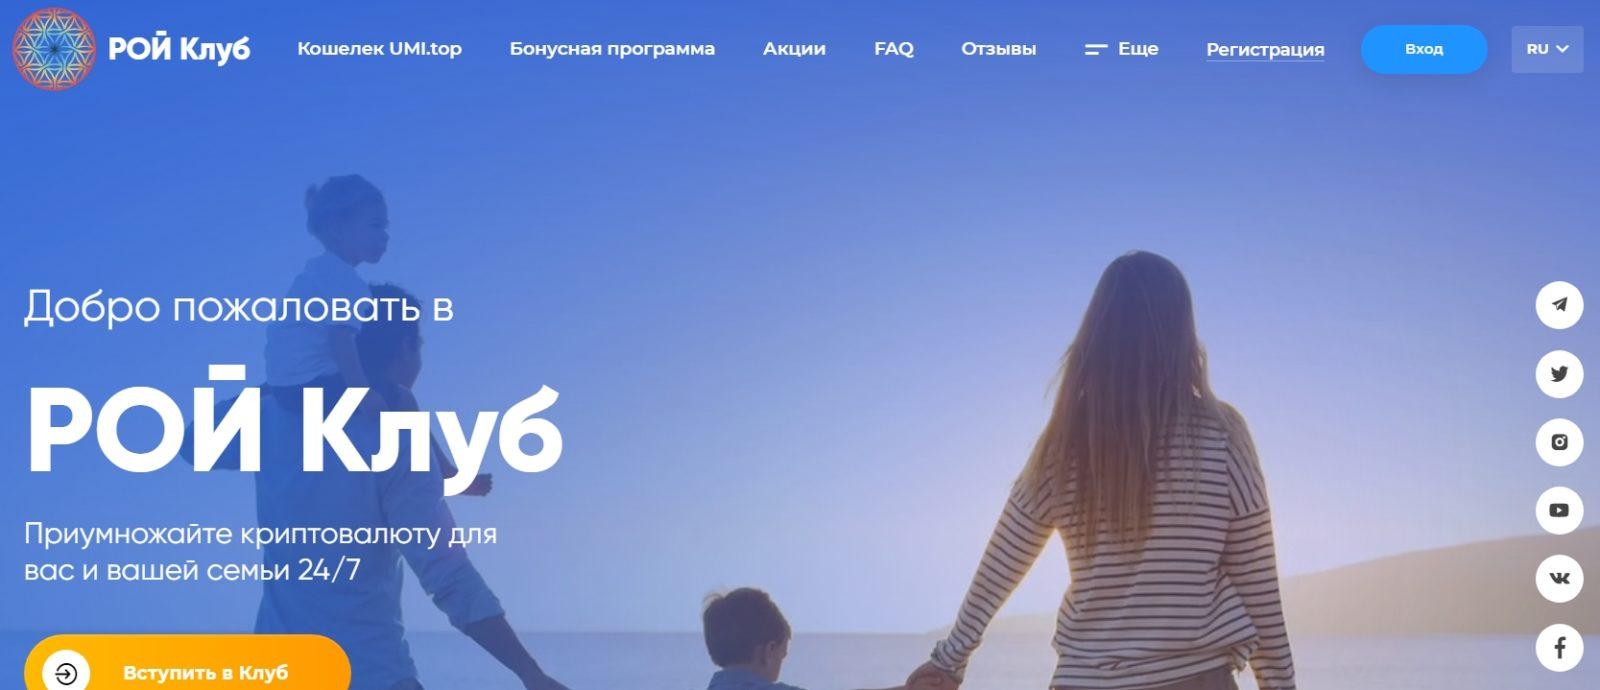 Сайт проекта ROY Club